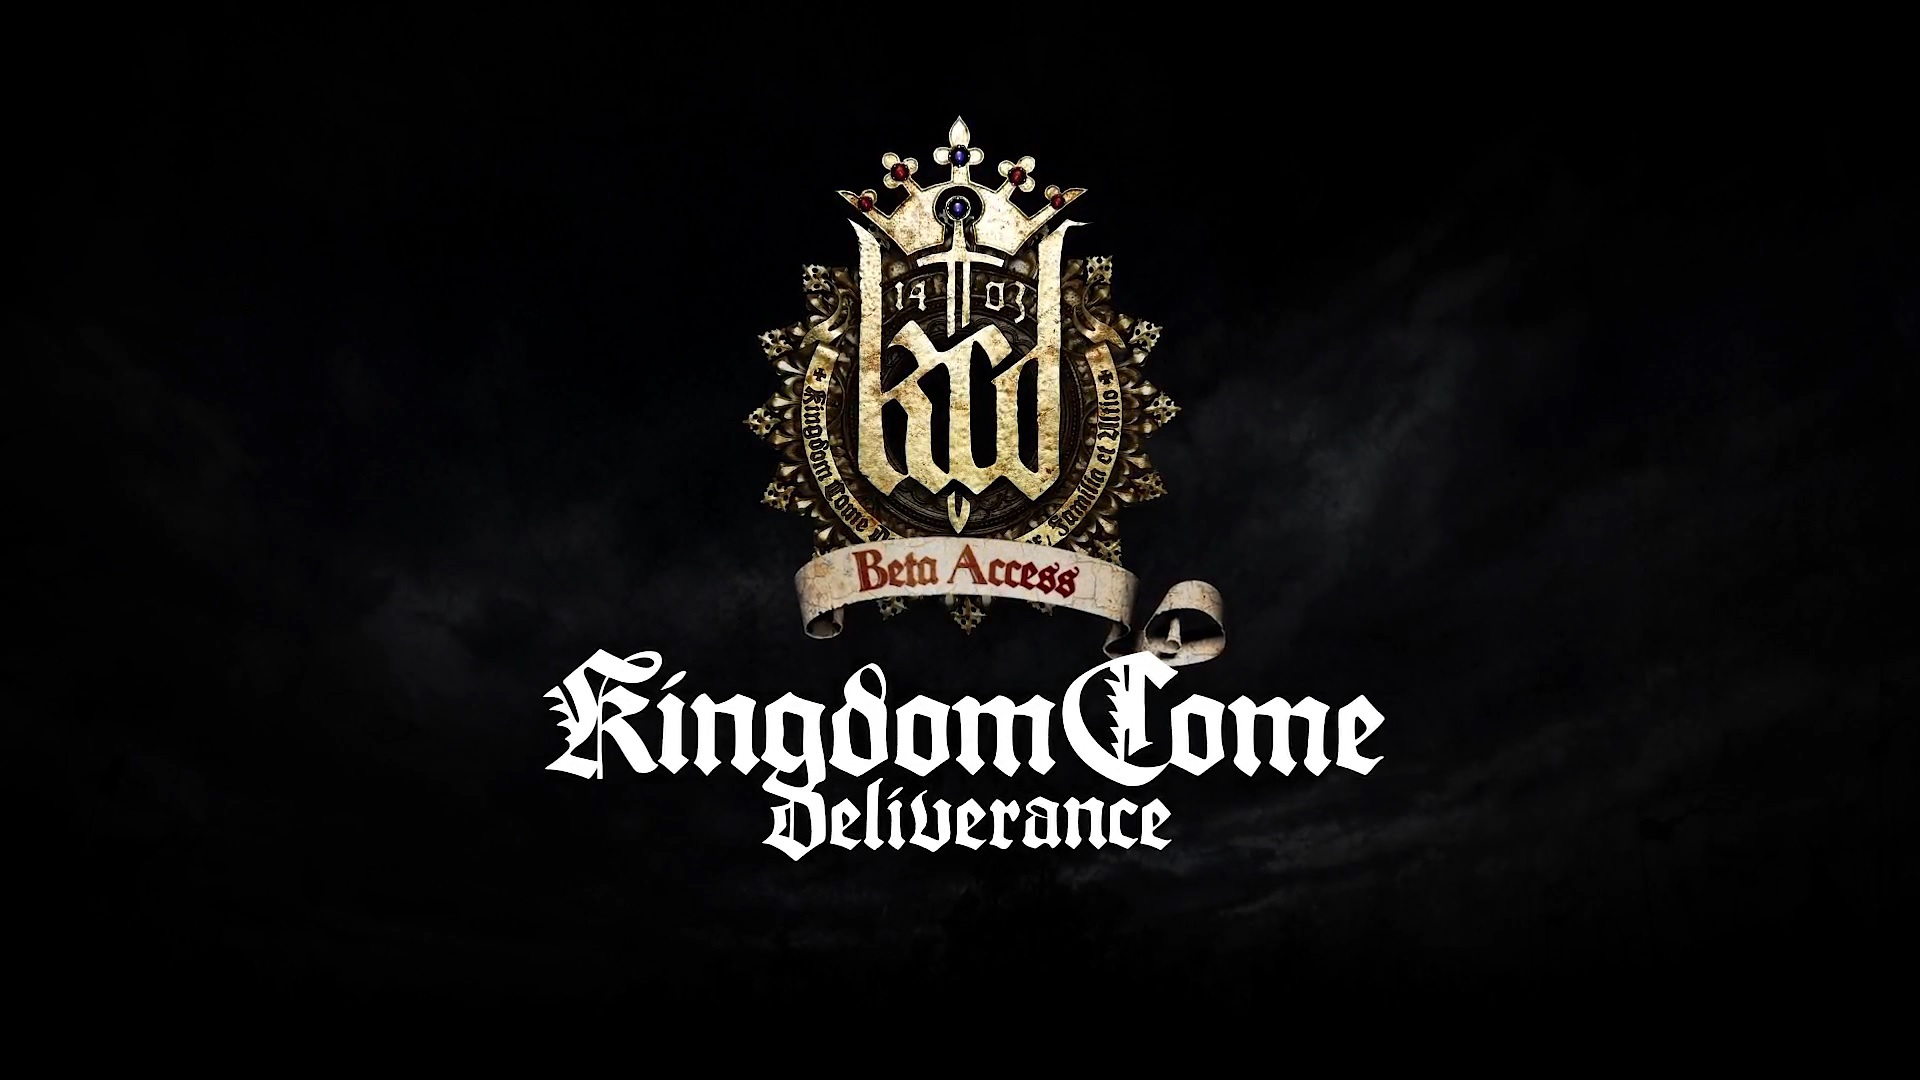 Kingdom Come: Deliverance Wallpapers Images Photos ...